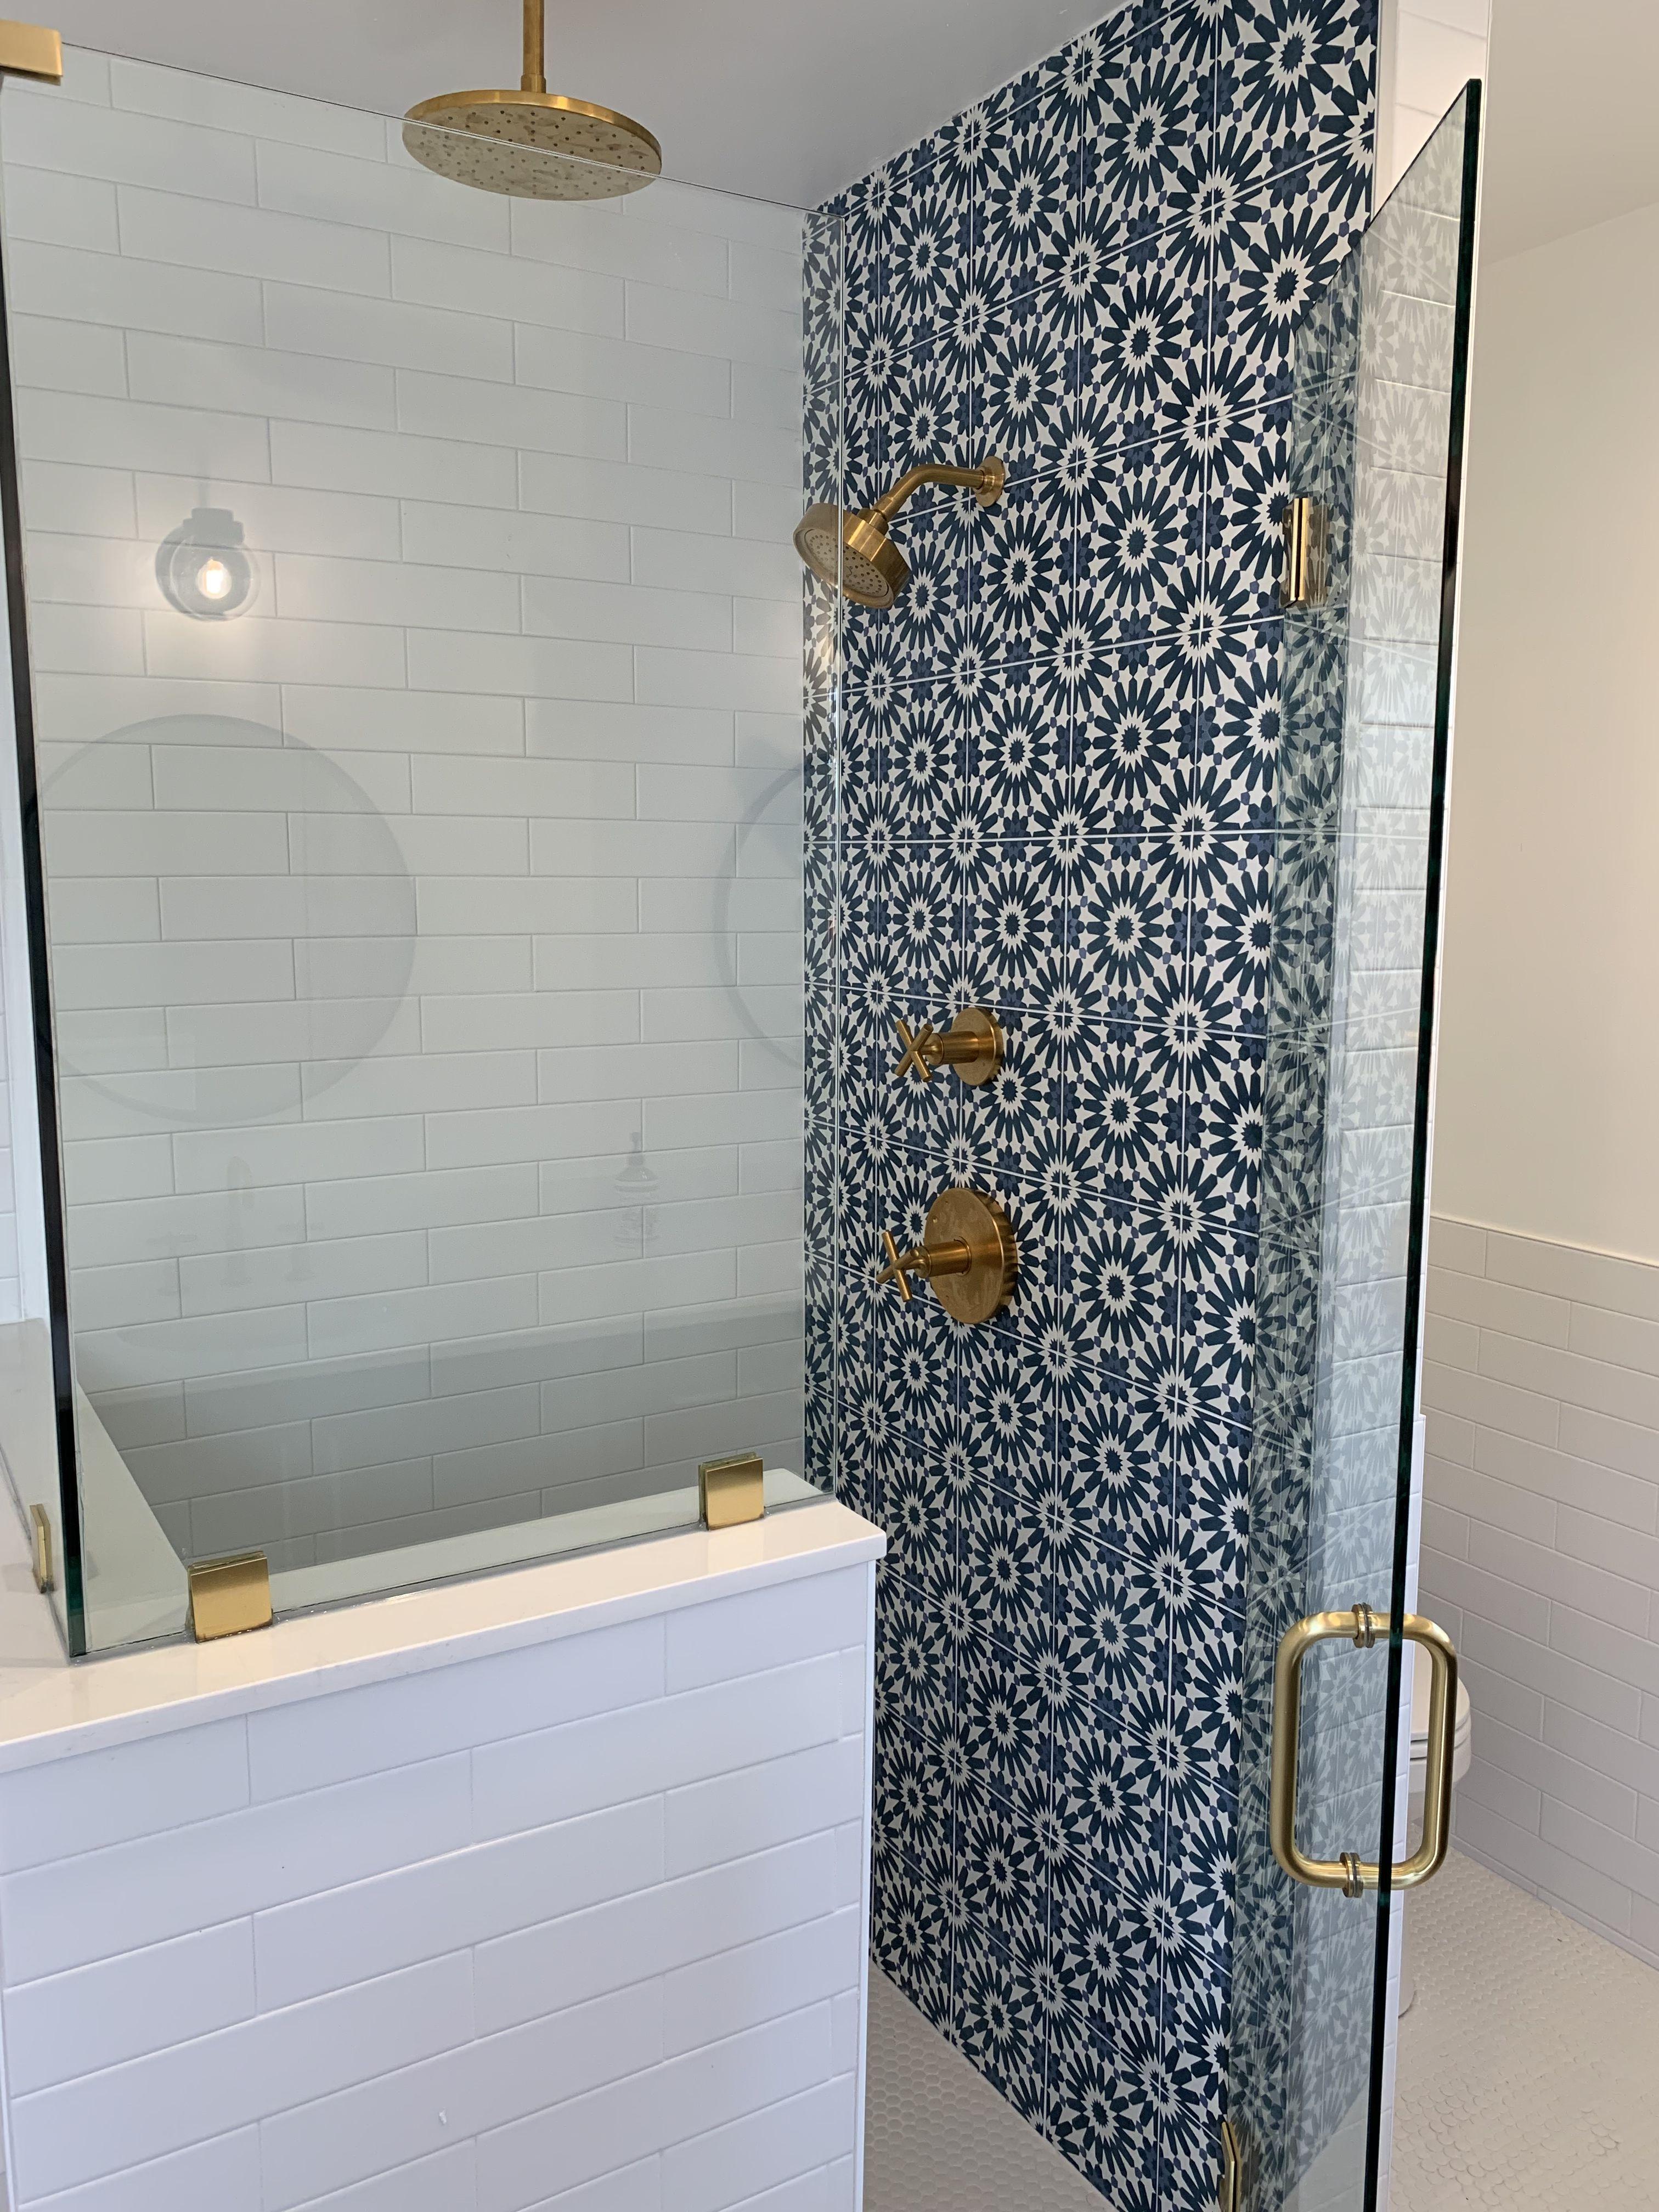 Riad Tile Cement Tile Erizo Blue Tile Accent Wall Bathroom Cement Tiles Bathroom Shower Tile